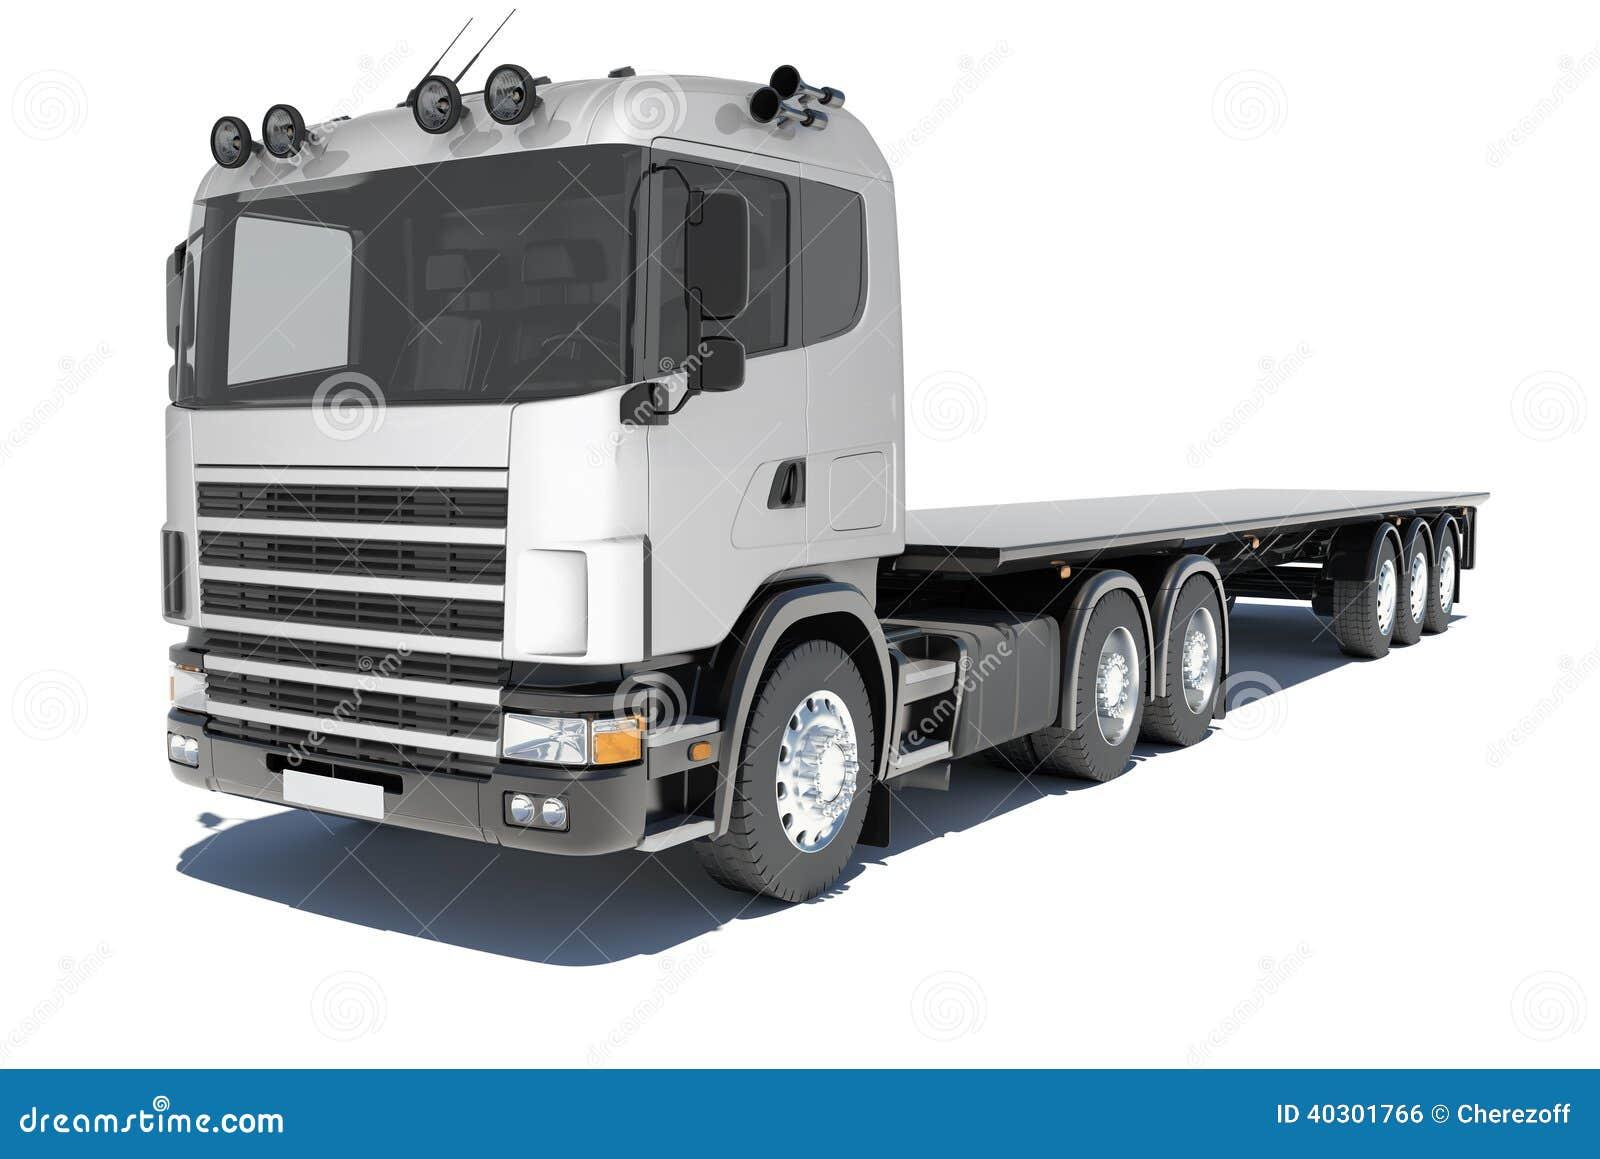 camion avec la plate forme de semi remorque illustration stock illustration du transport long. Black Bedroom Furniture Sets. Home Design Ideas